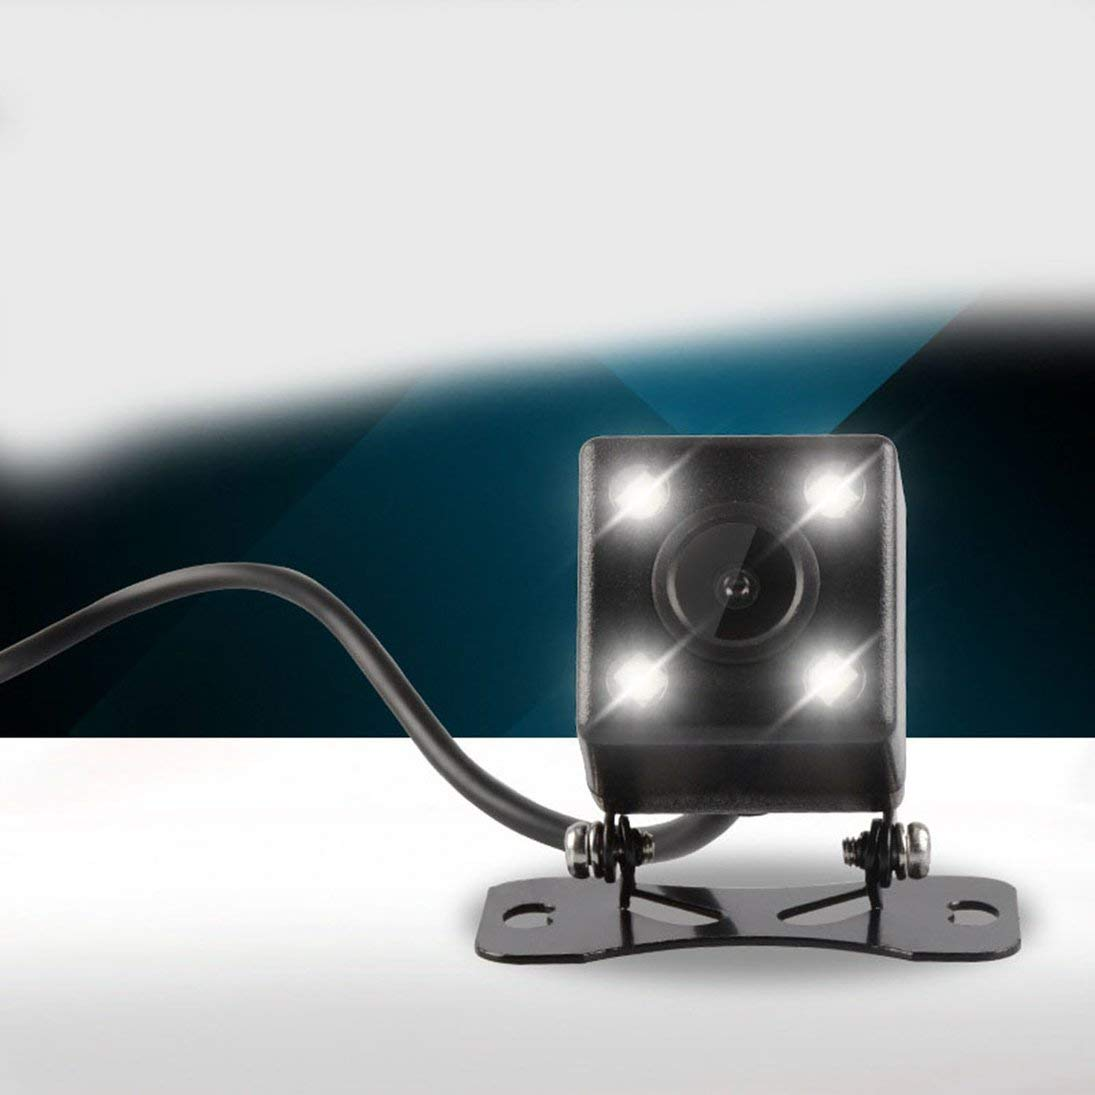 Togames-ES Reversing Camera HD Universal Plug-in Car Camera Car Rear View Camera170 Degrees High Definition